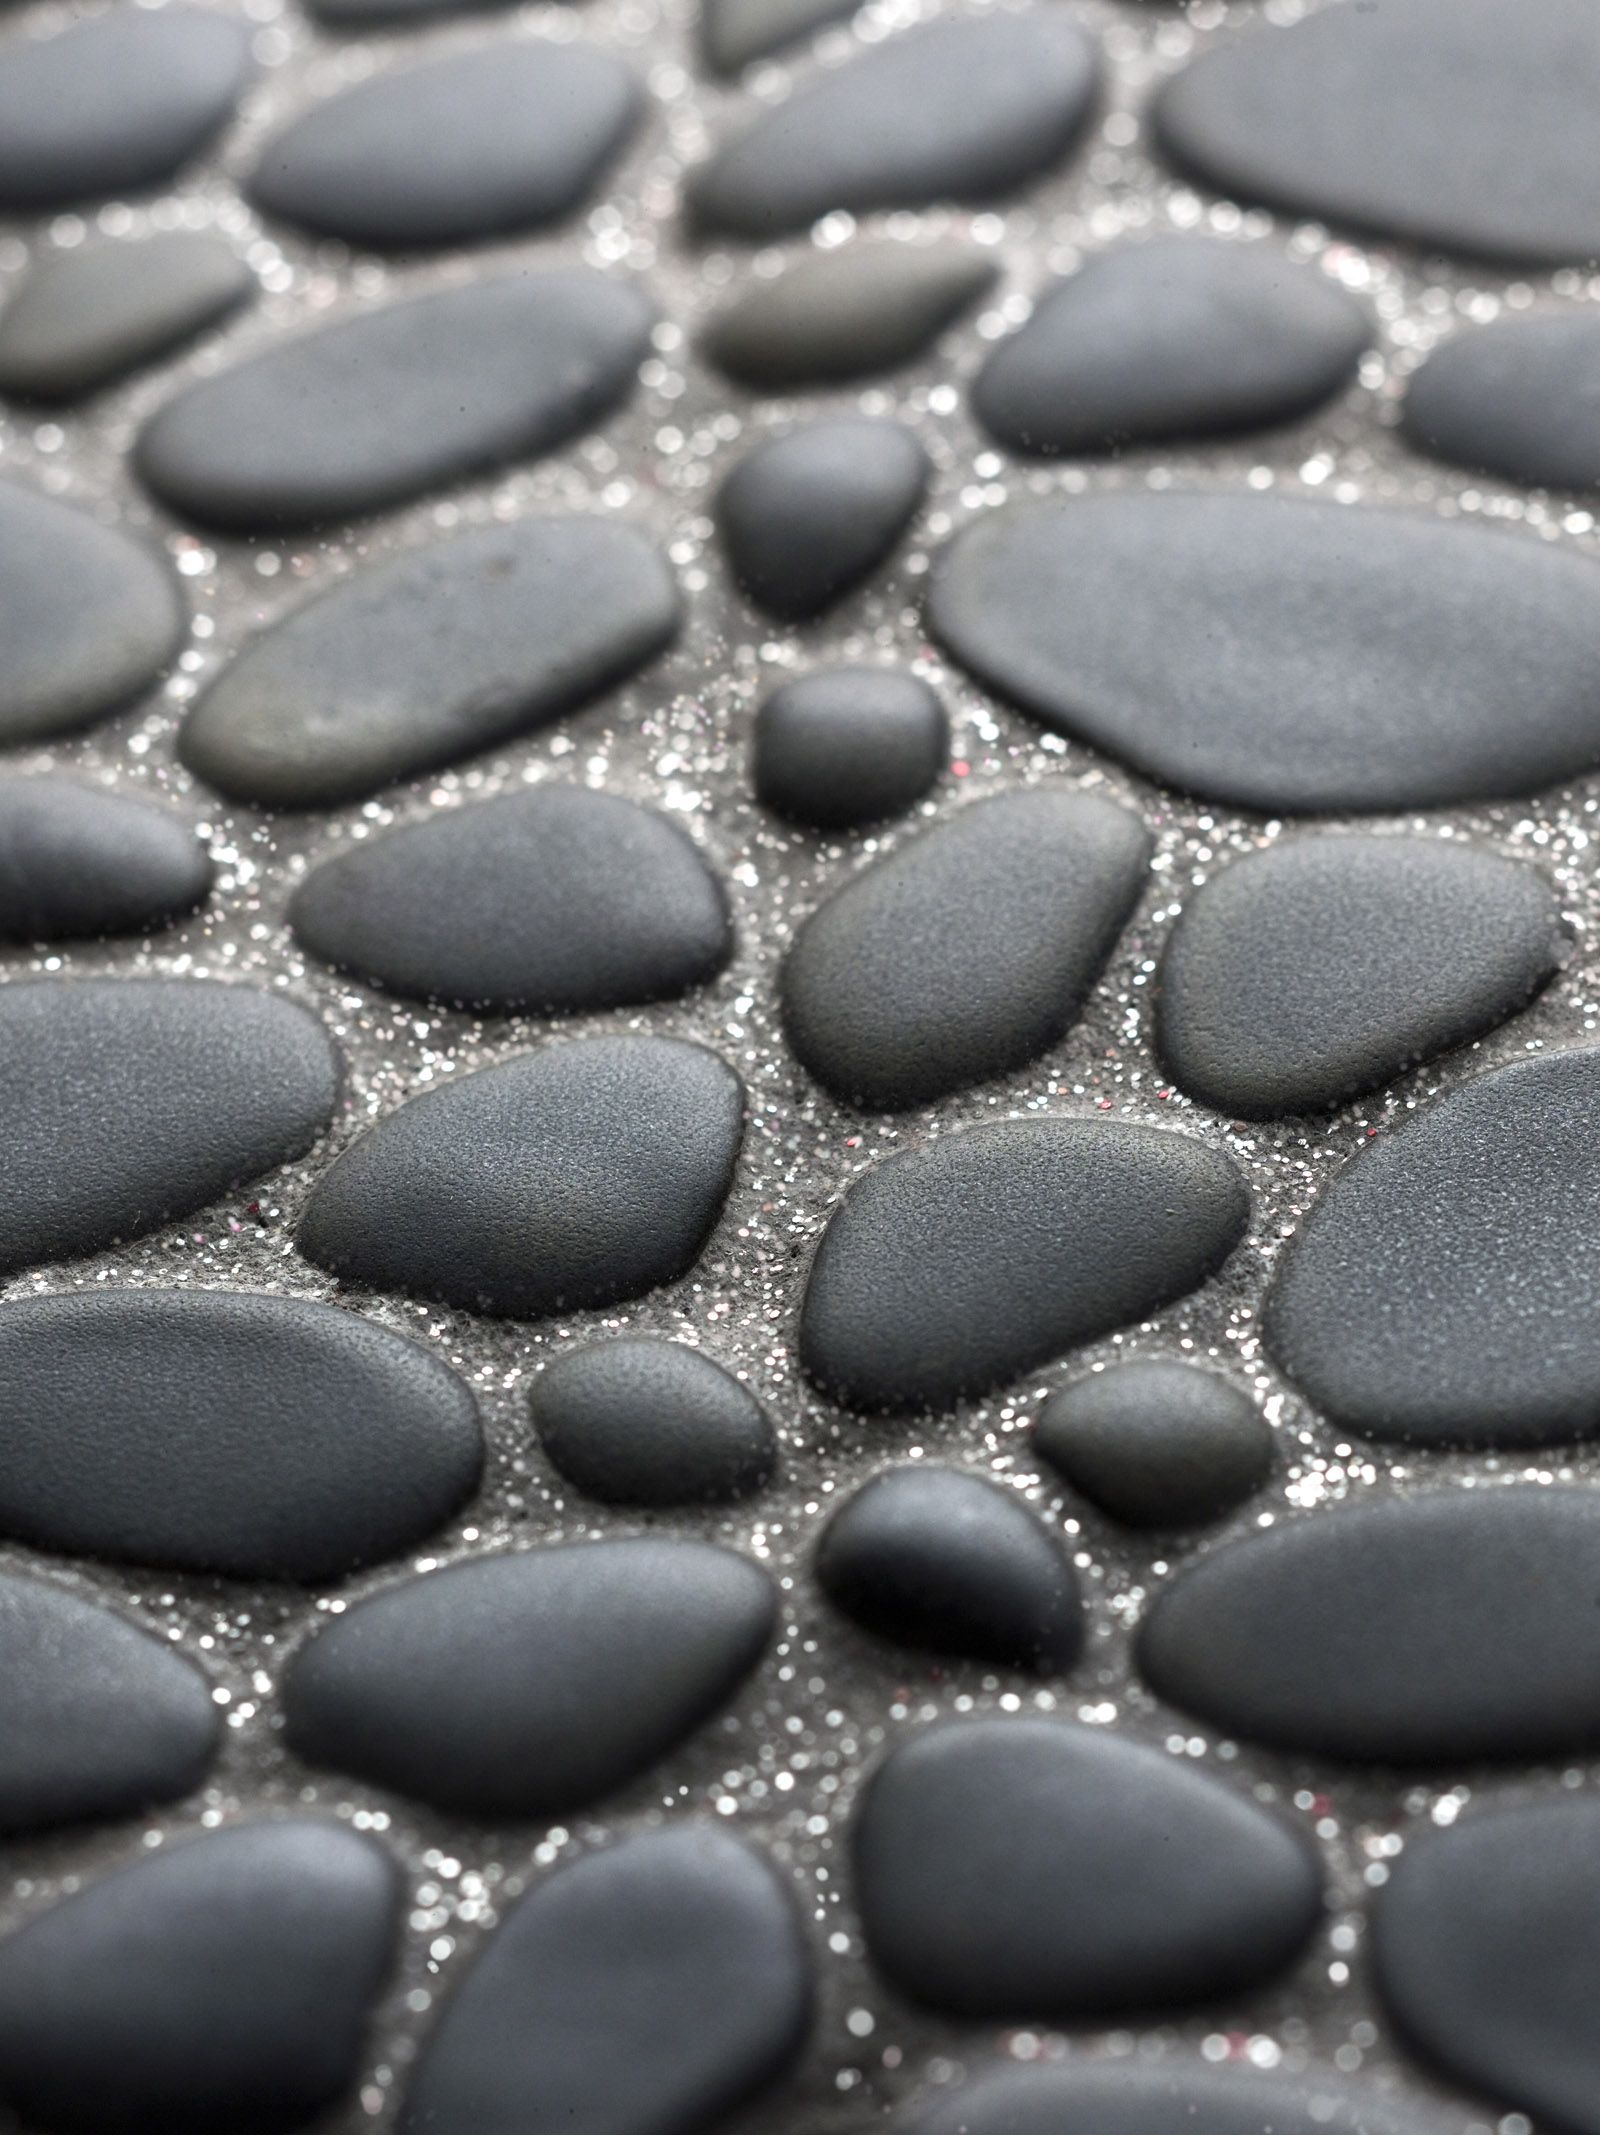 Pin By Manda Malice On Home Decor Organization Inspiration Glitter Wall Shower Floor Glitter Grout